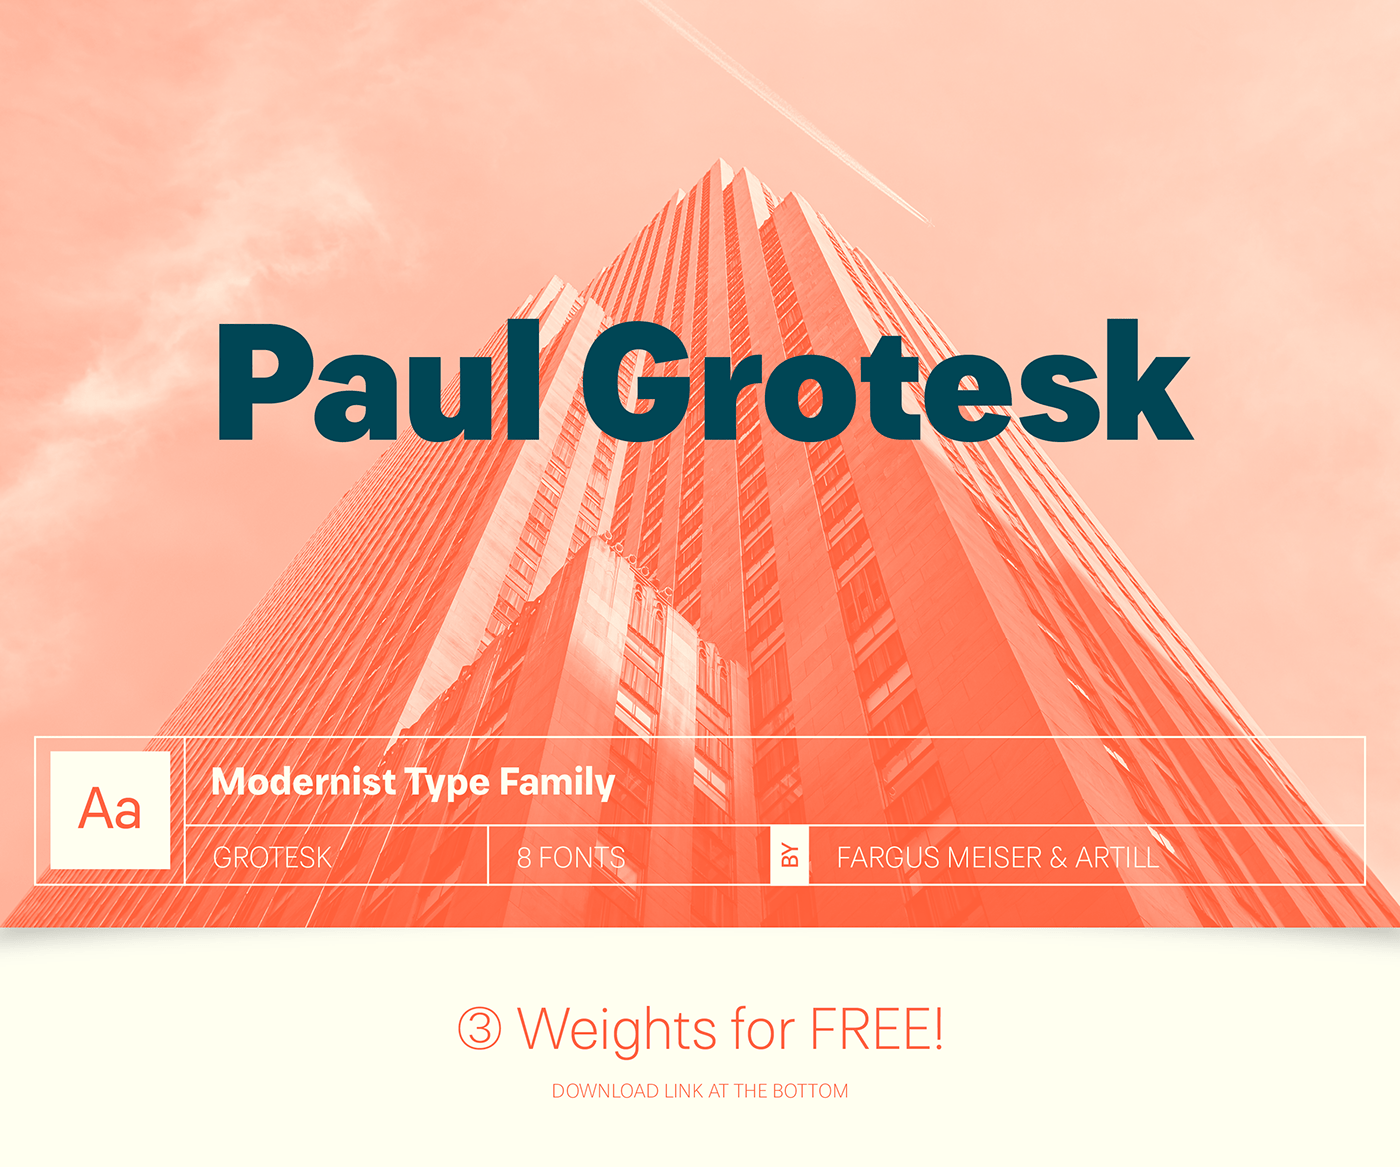 Paul Grotesk Sans Serif Typeface-1